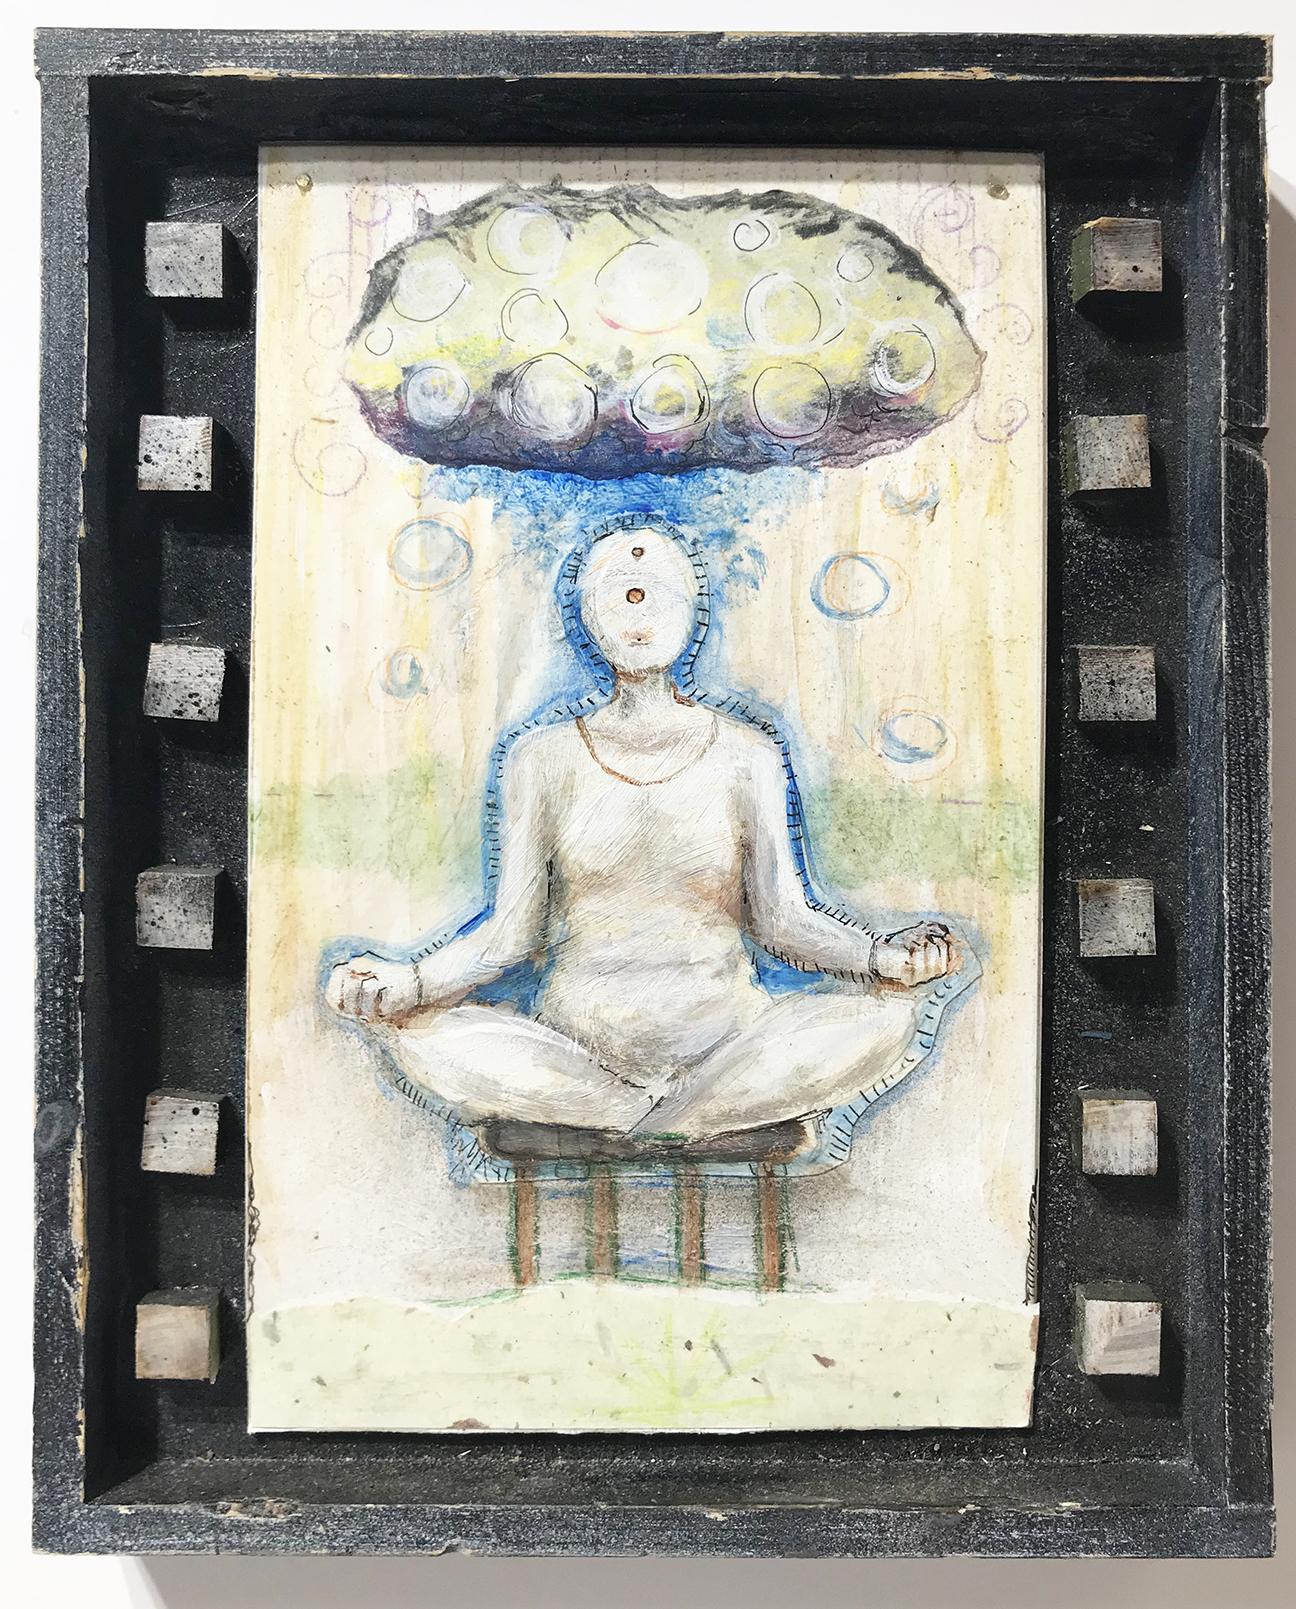 meditated-goo-2001